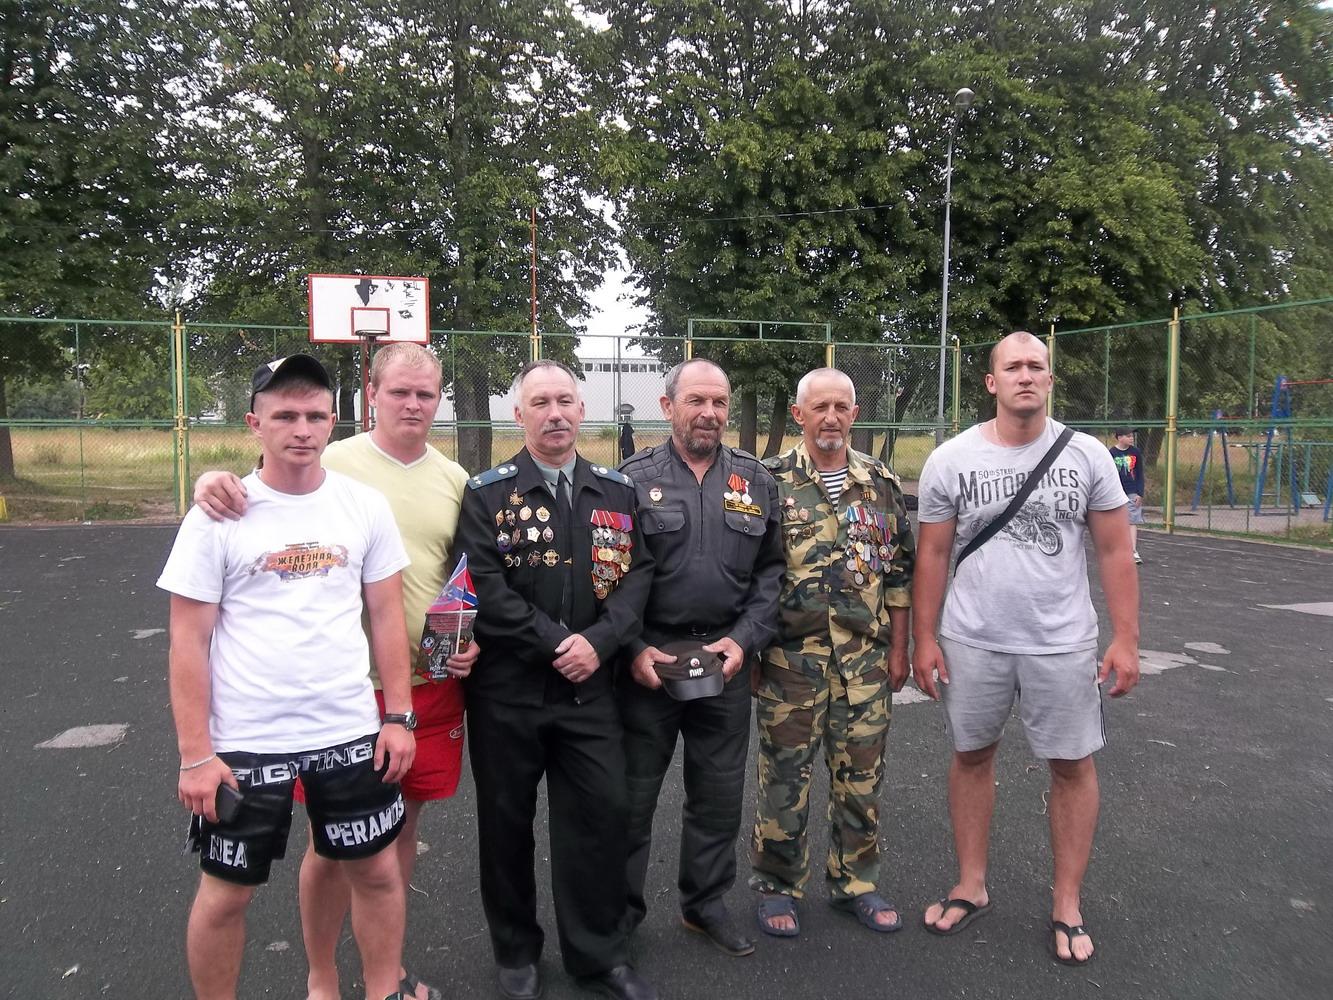 Kaliningrad regional department & quot; Running charges & quot;